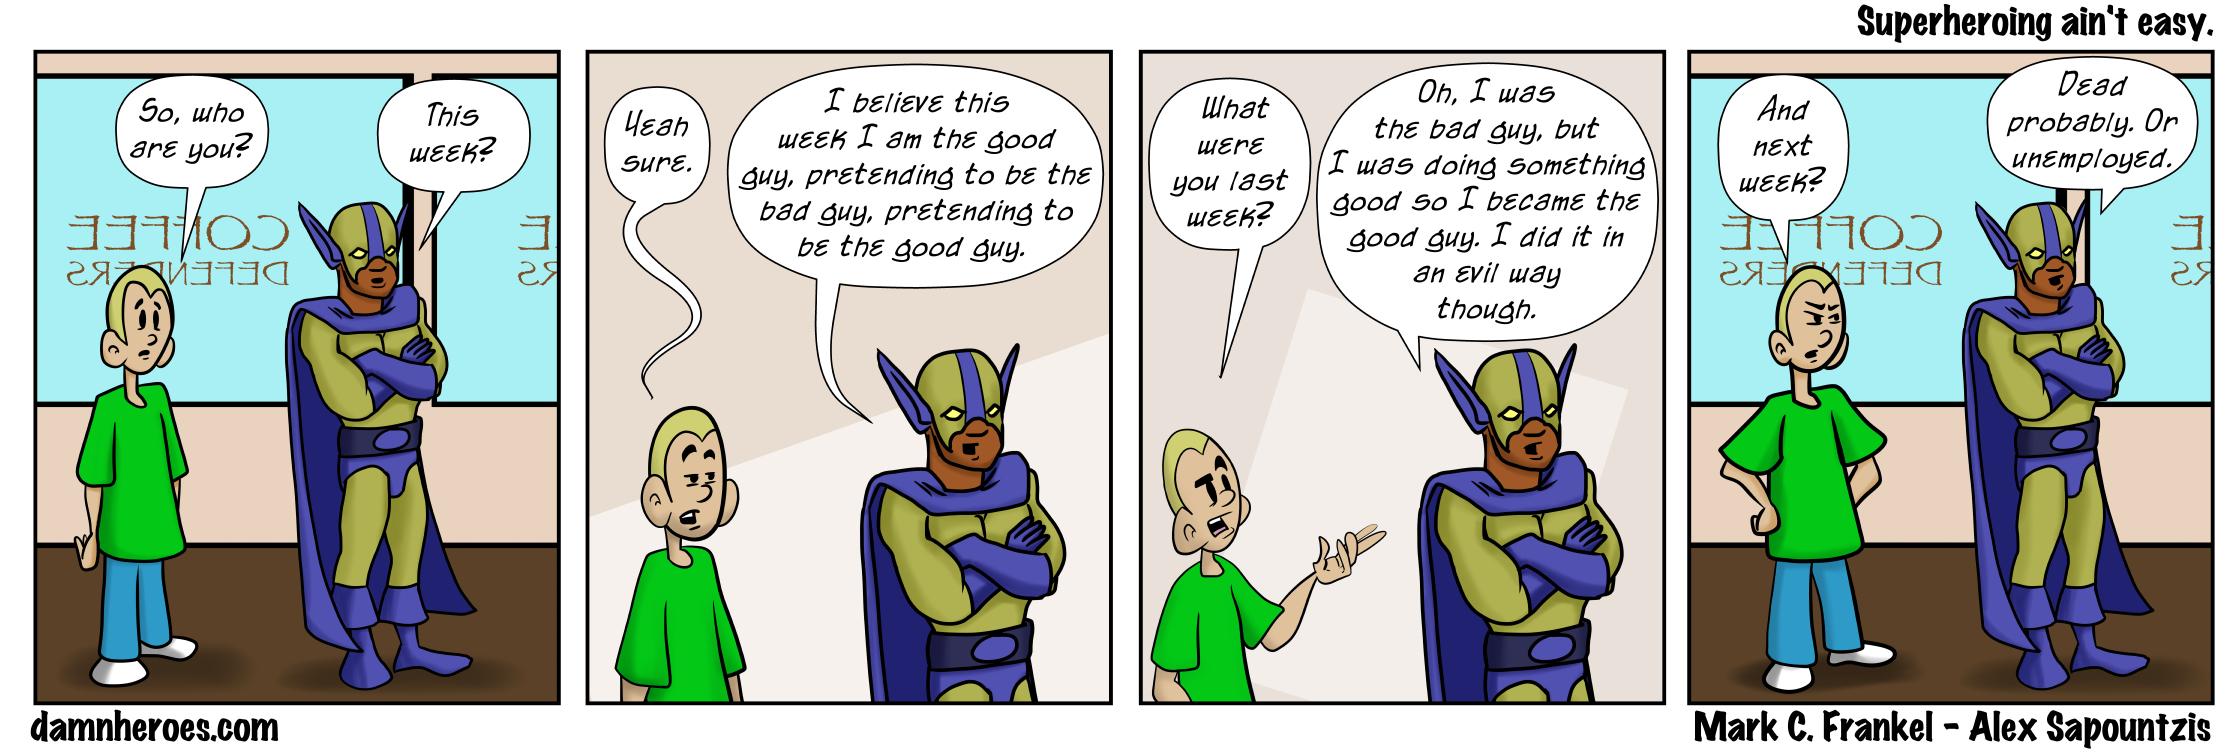 Superheroing ain't easy